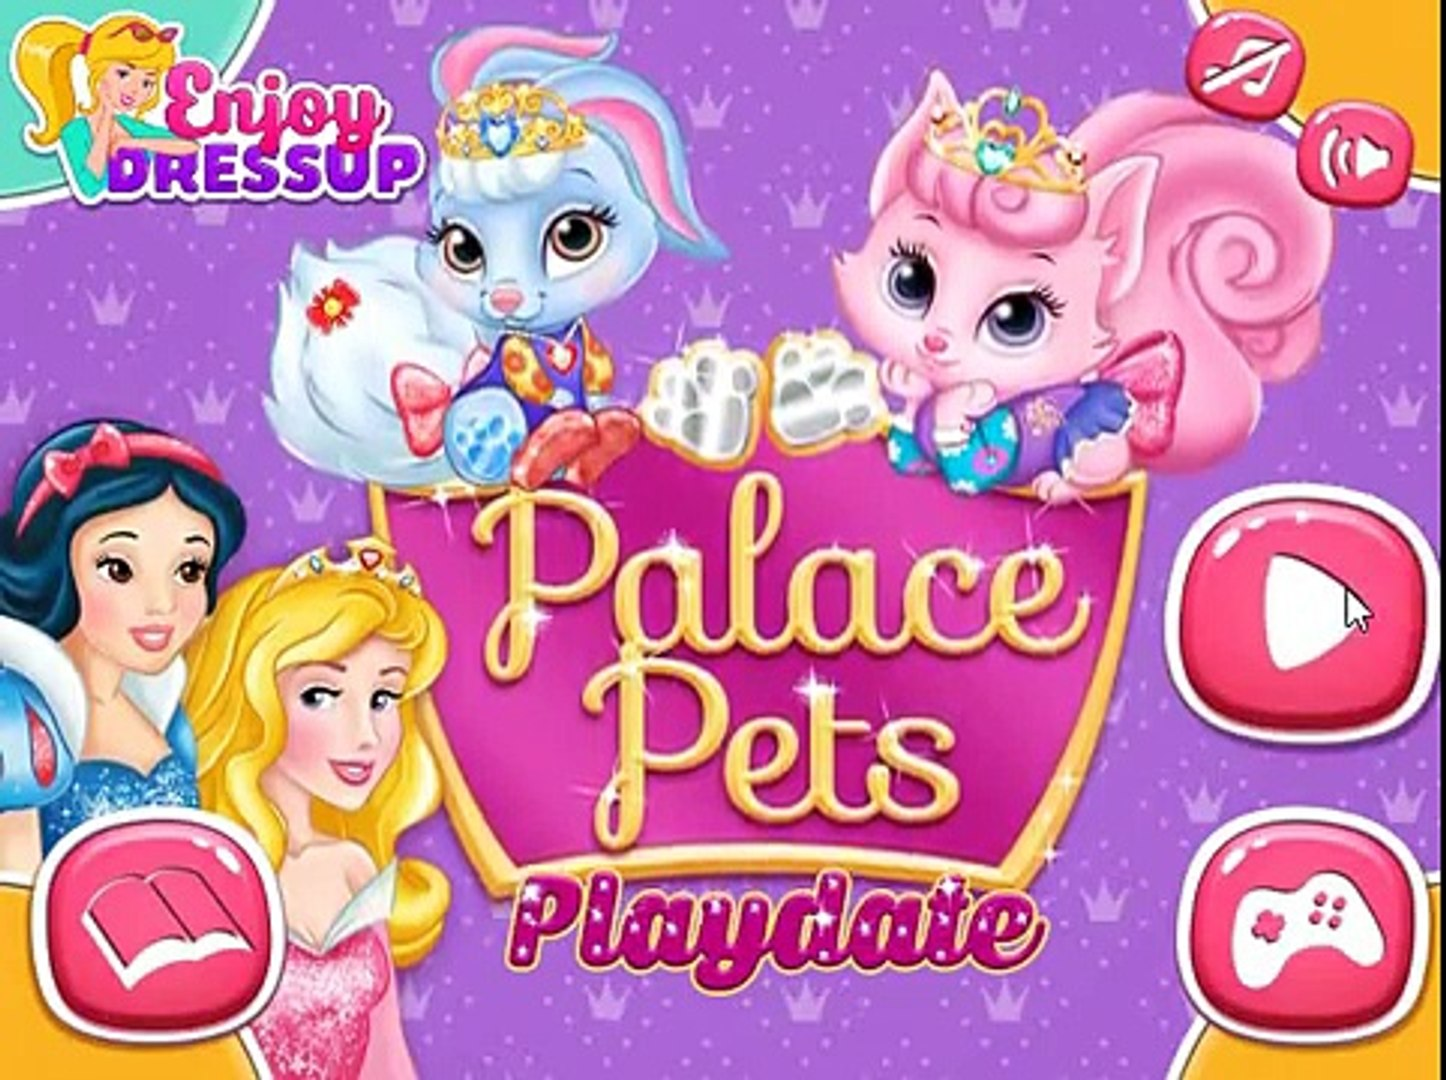 DISNEY PRINCESS PALACE PETS - BLANCANIEVES Y AURORA PALACE PET-SNOW WHITE AURORA PALACE PET